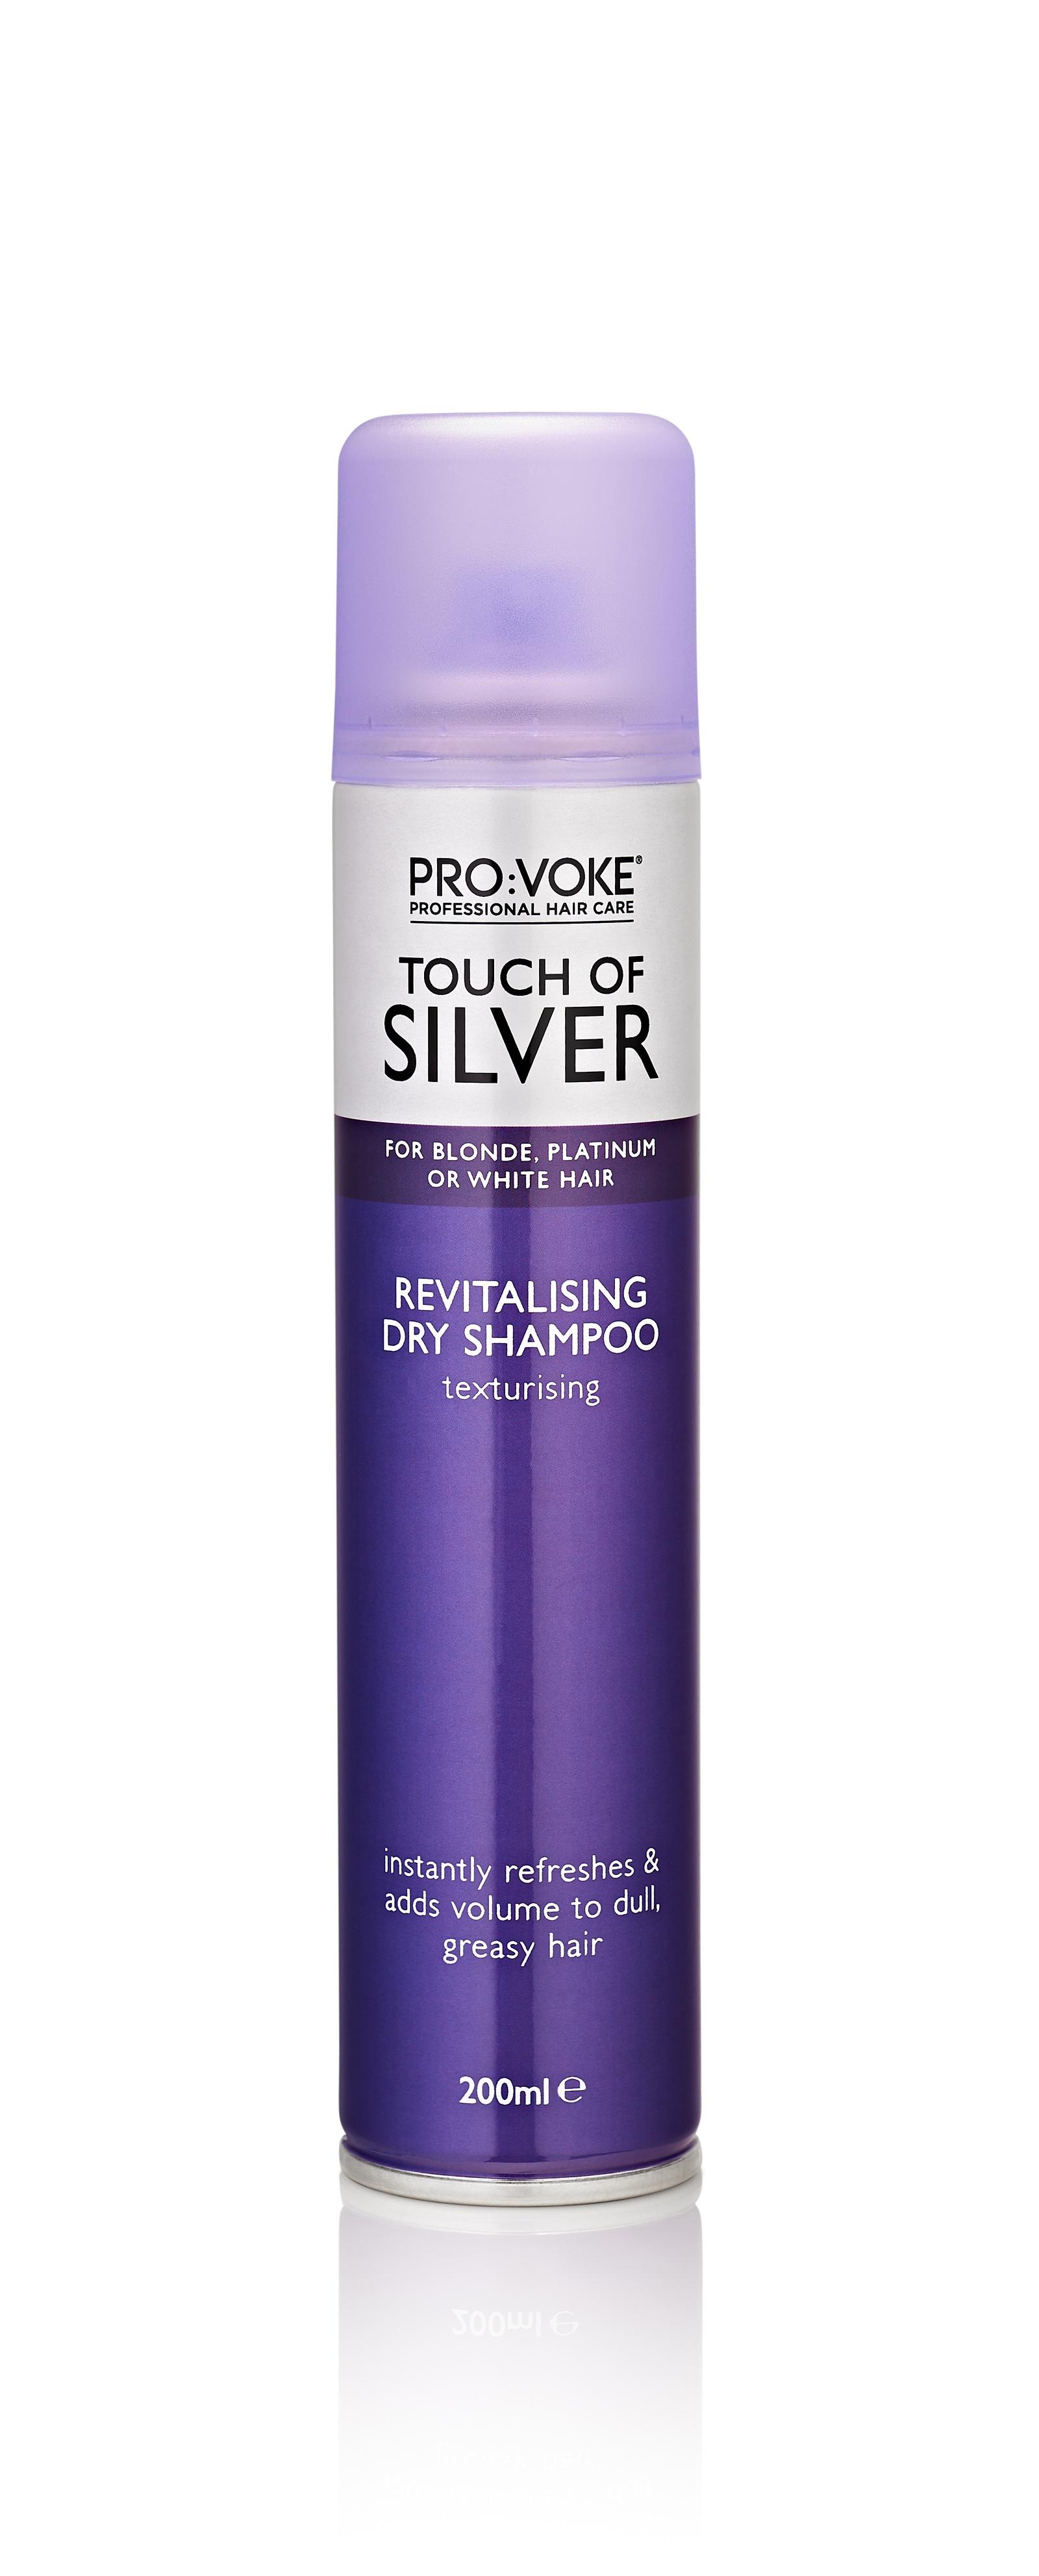 Сухой шампунь Provoke TOUCH OF SILVER, восстанавливающий, защищающий цвет волос цена и фото